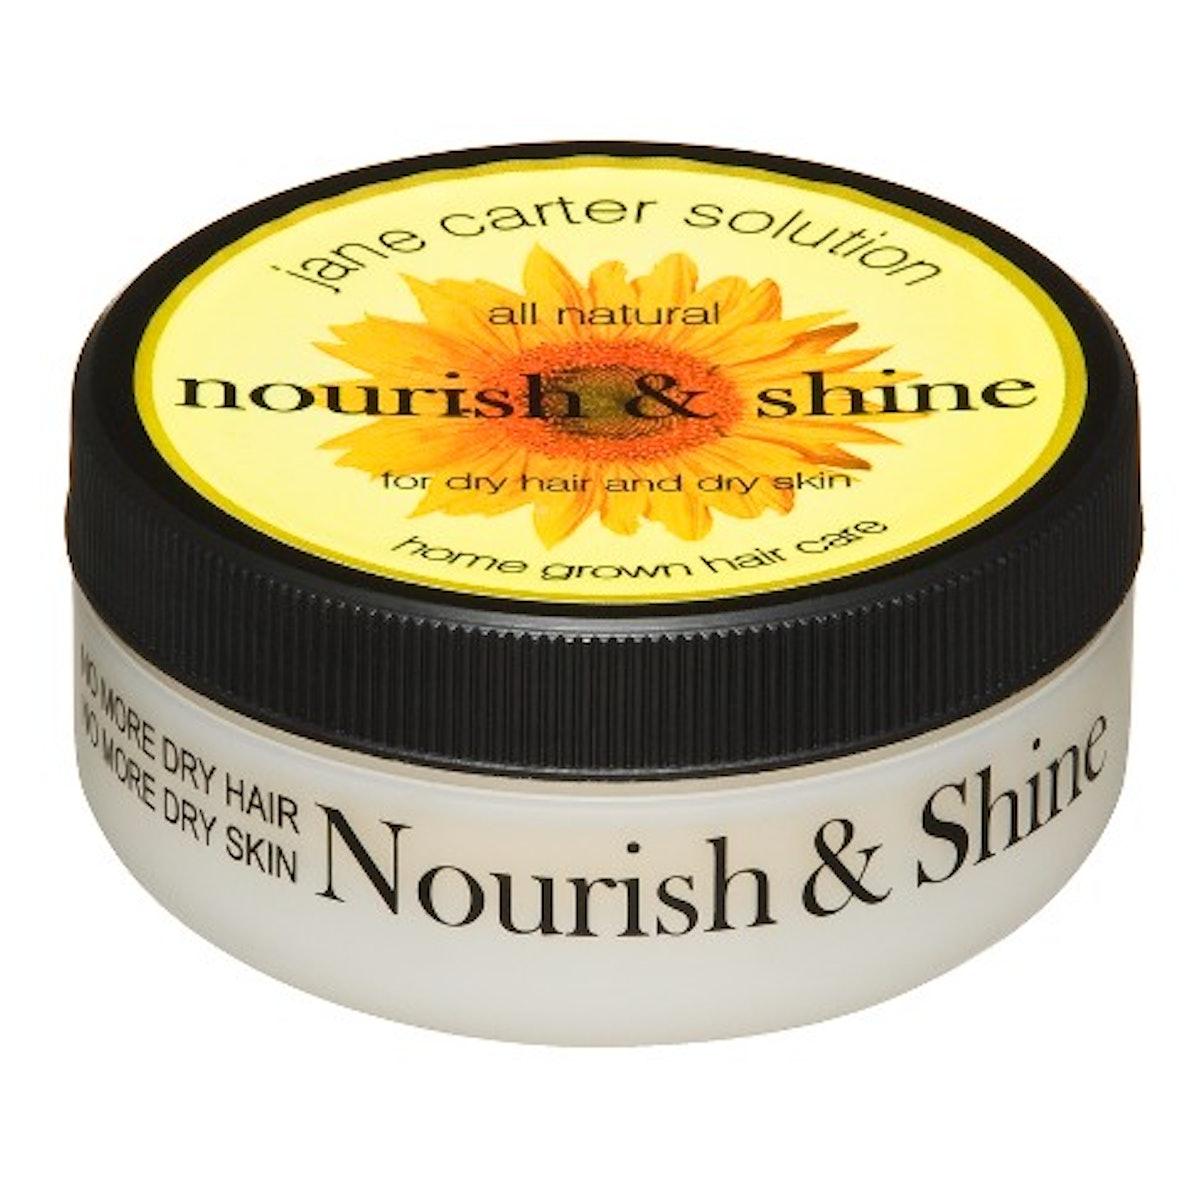 Nourish and Shine